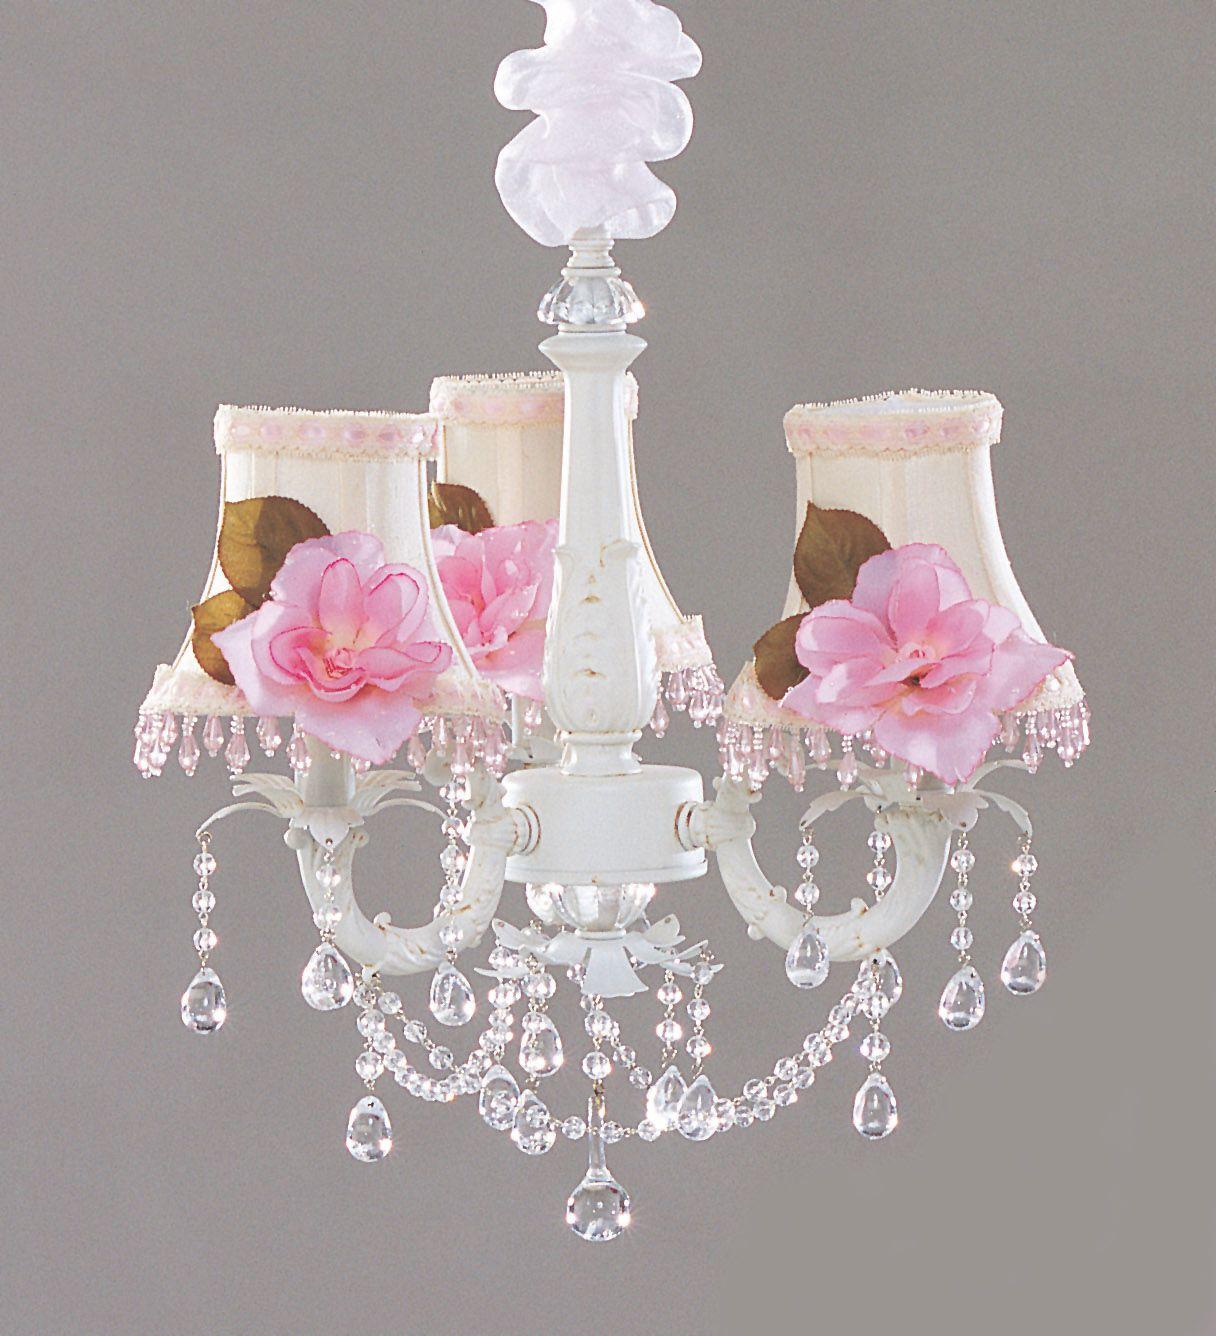 Pin by irina on barroko pinterest mini chandelier chandeliers shabby chic mini chandeliers allieg 328276 bytes aloadofball Images